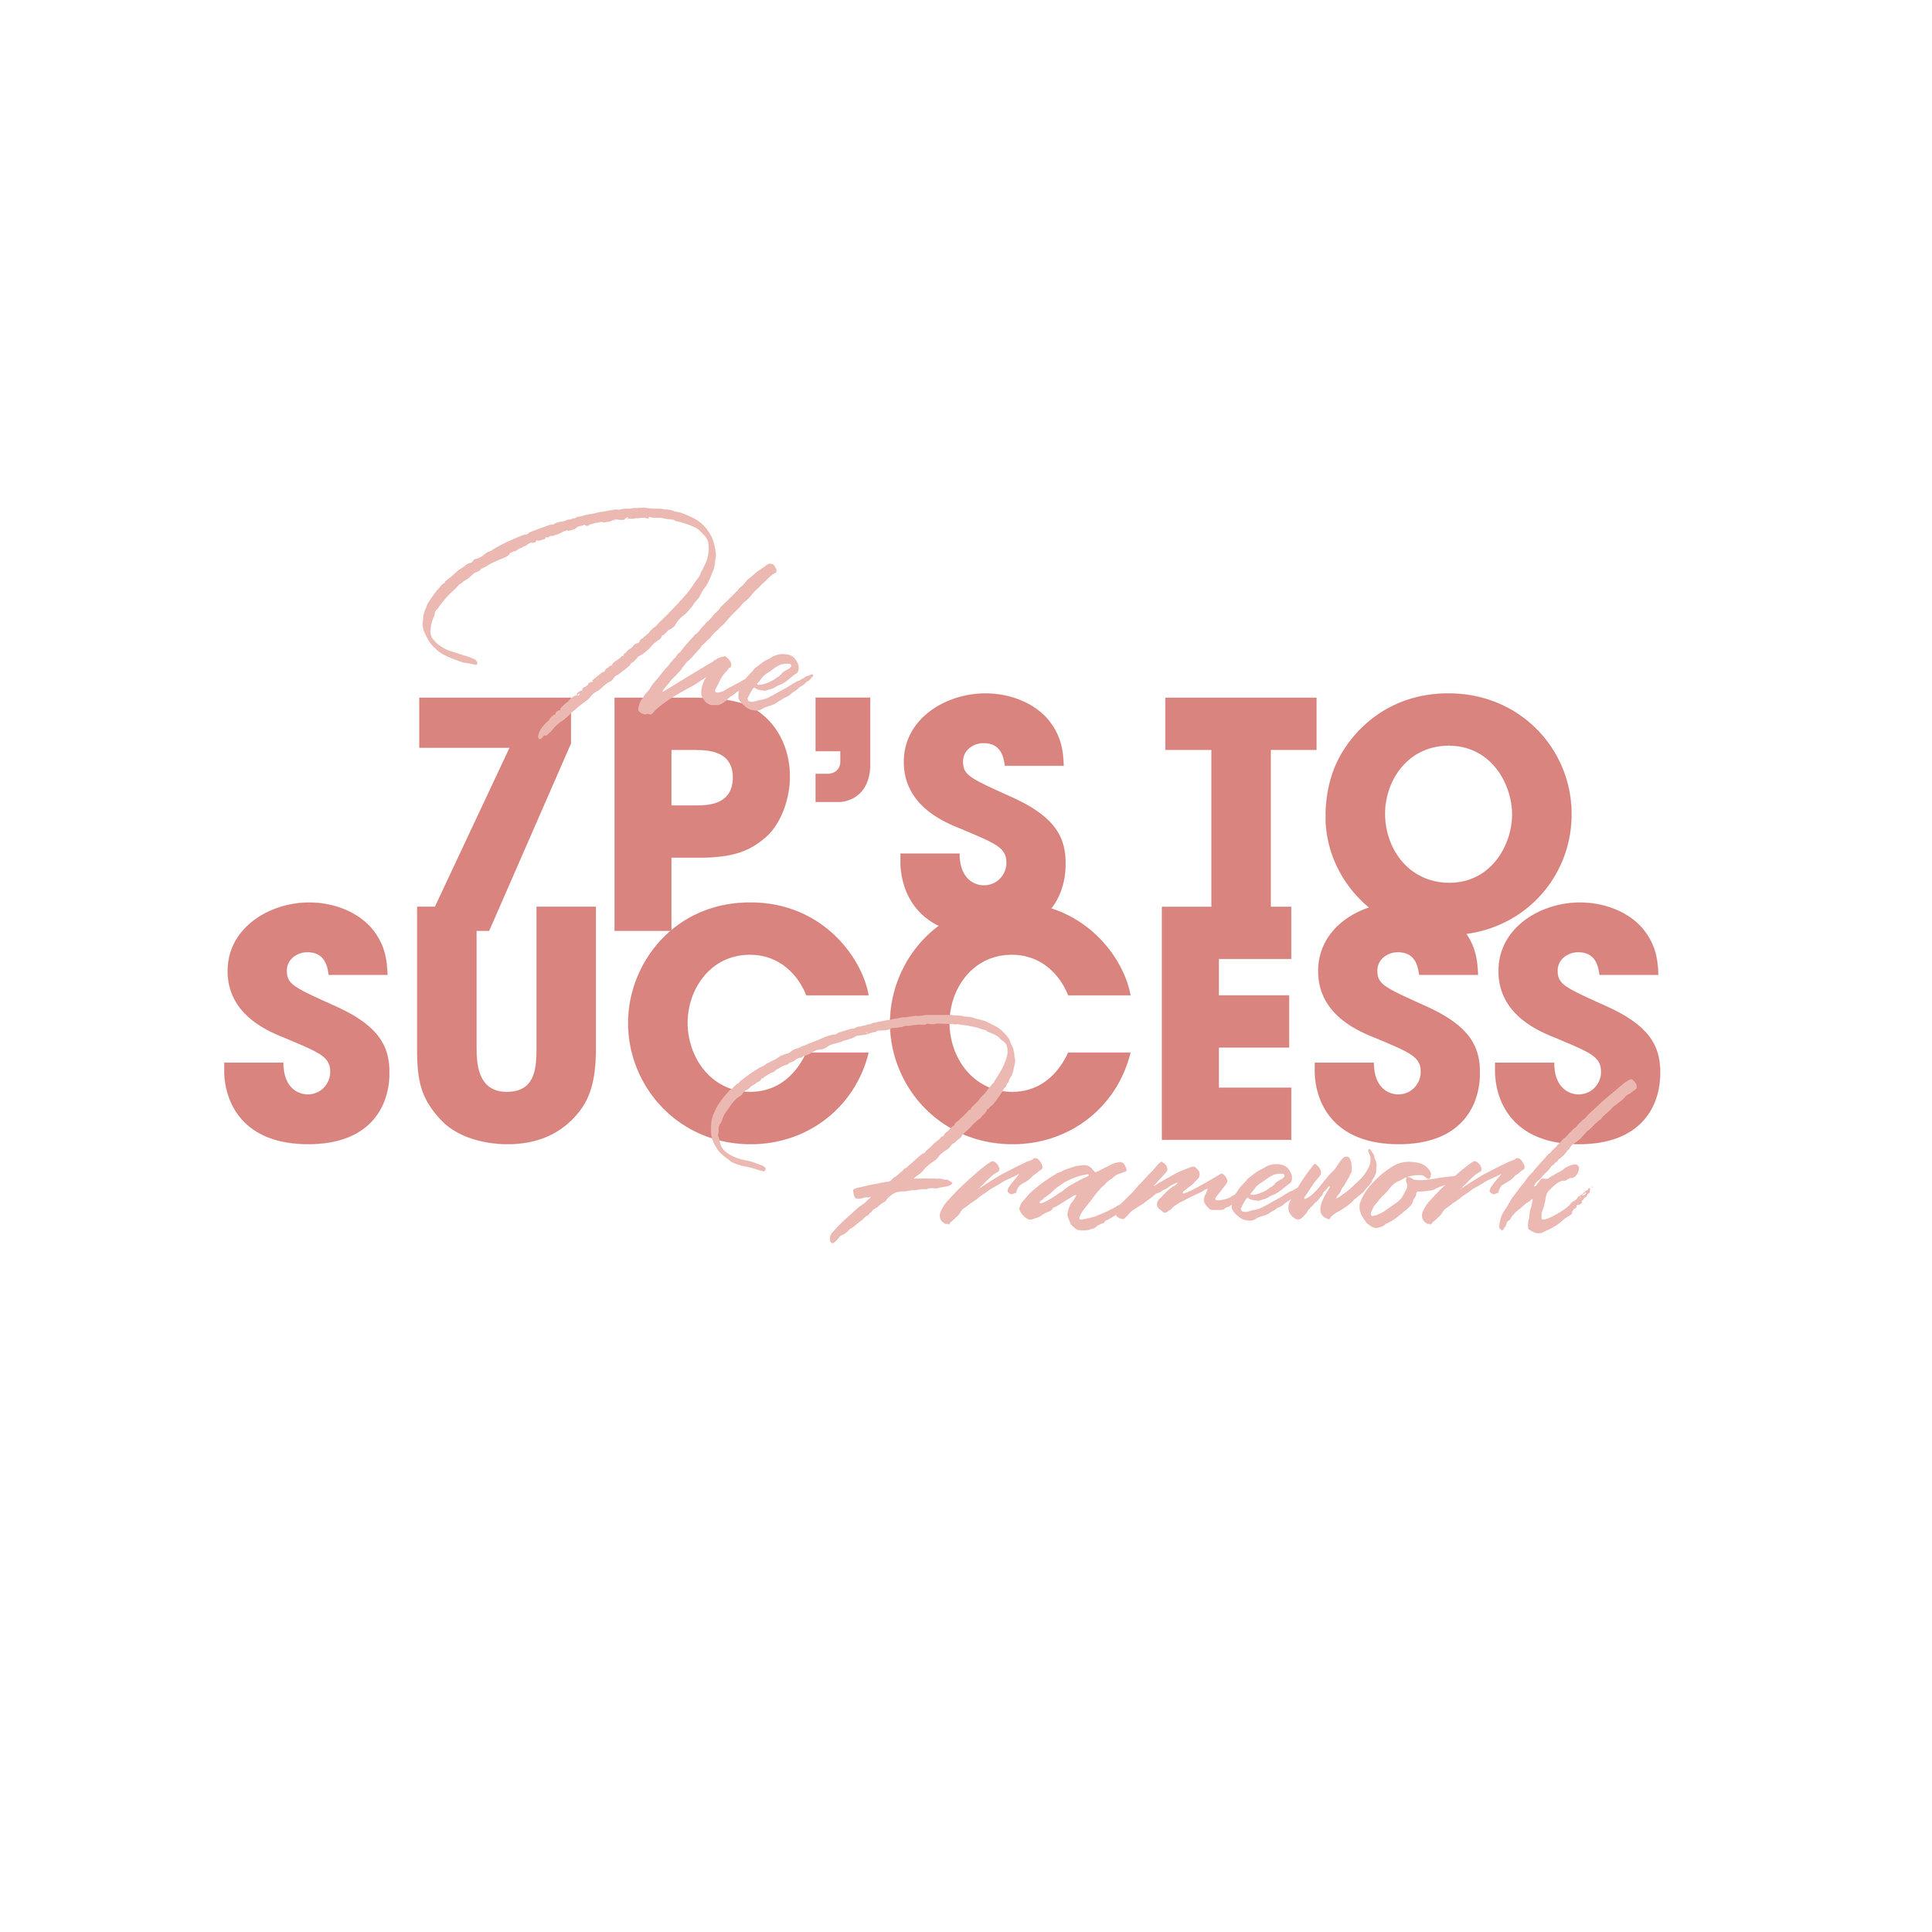 7 P TO SUCCESS PILLARS8.jpg